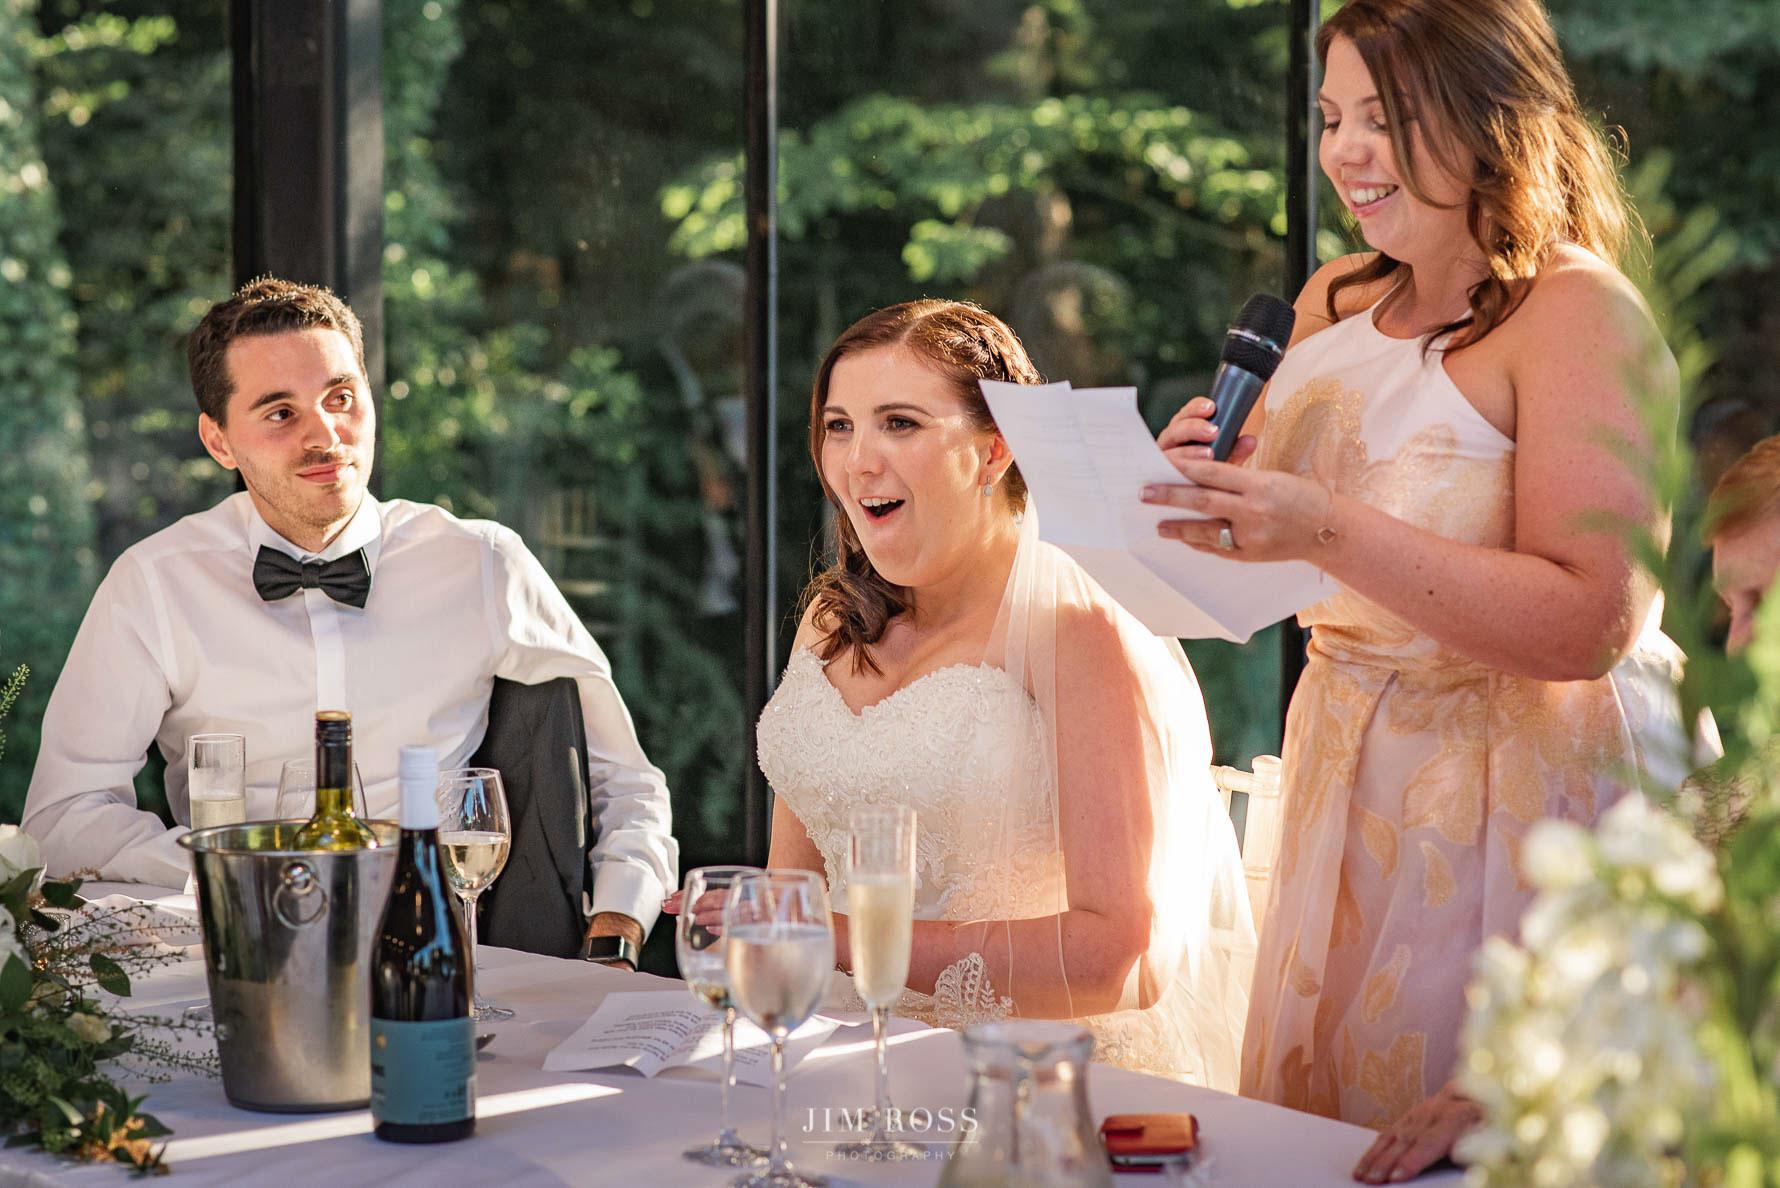 Bridesmaid makes bride blush